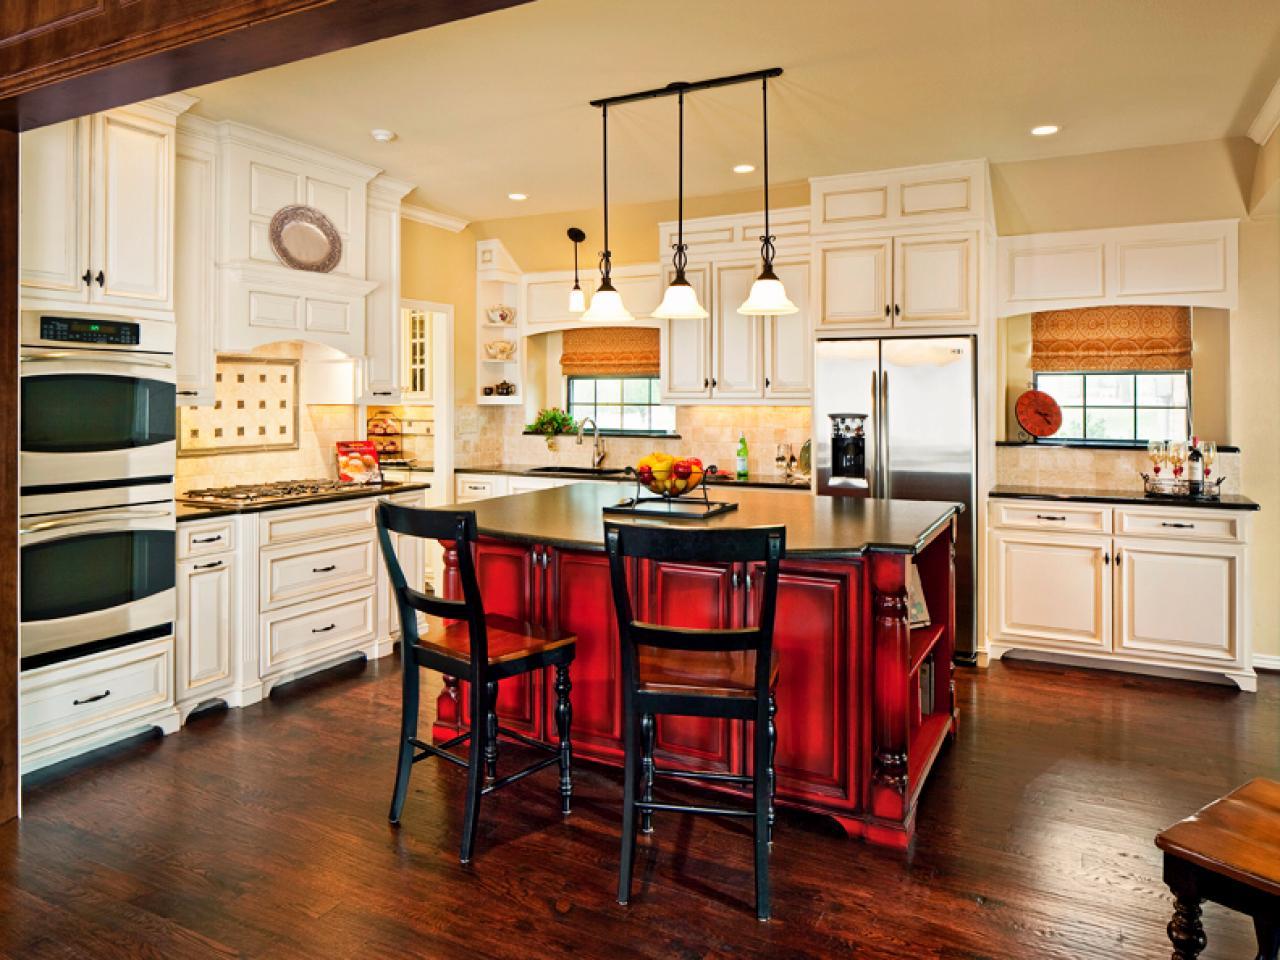 kitchen island design ideas pictures amp tips from hgtv hgtv 16 modern kitchen island design tips pinkous